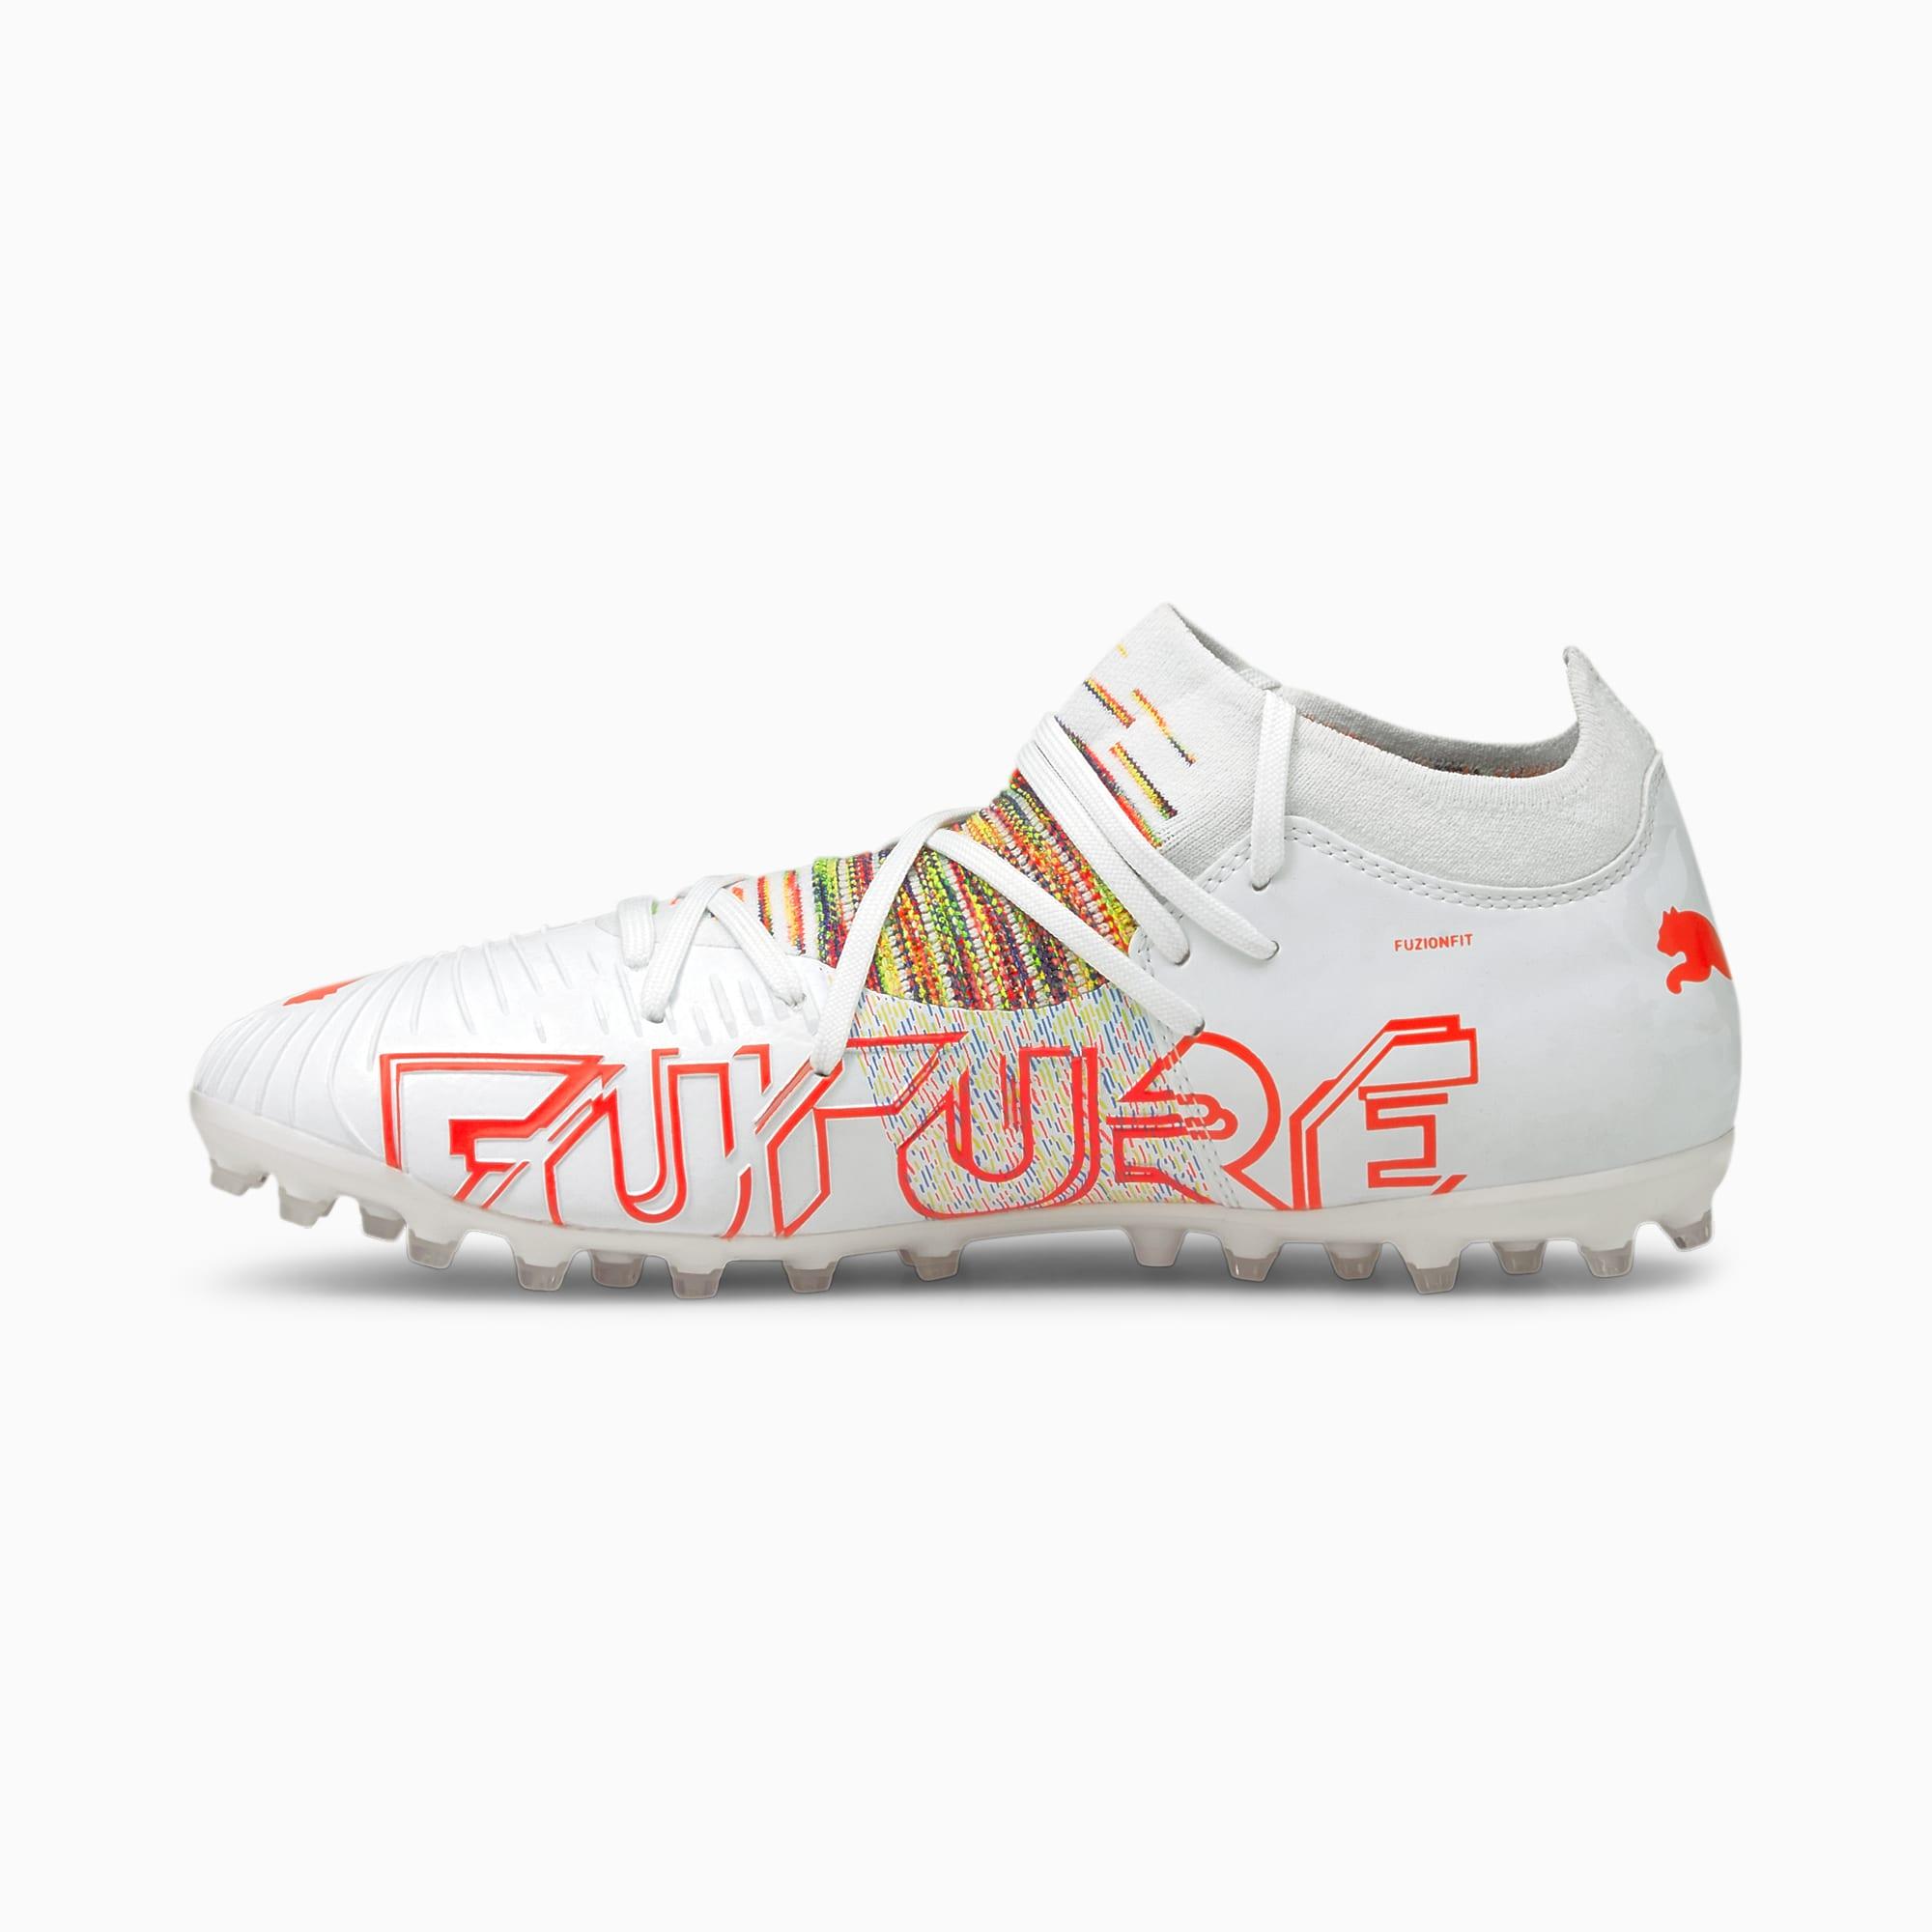 Chaussures de football FUTURE Z 3.1 MG homme